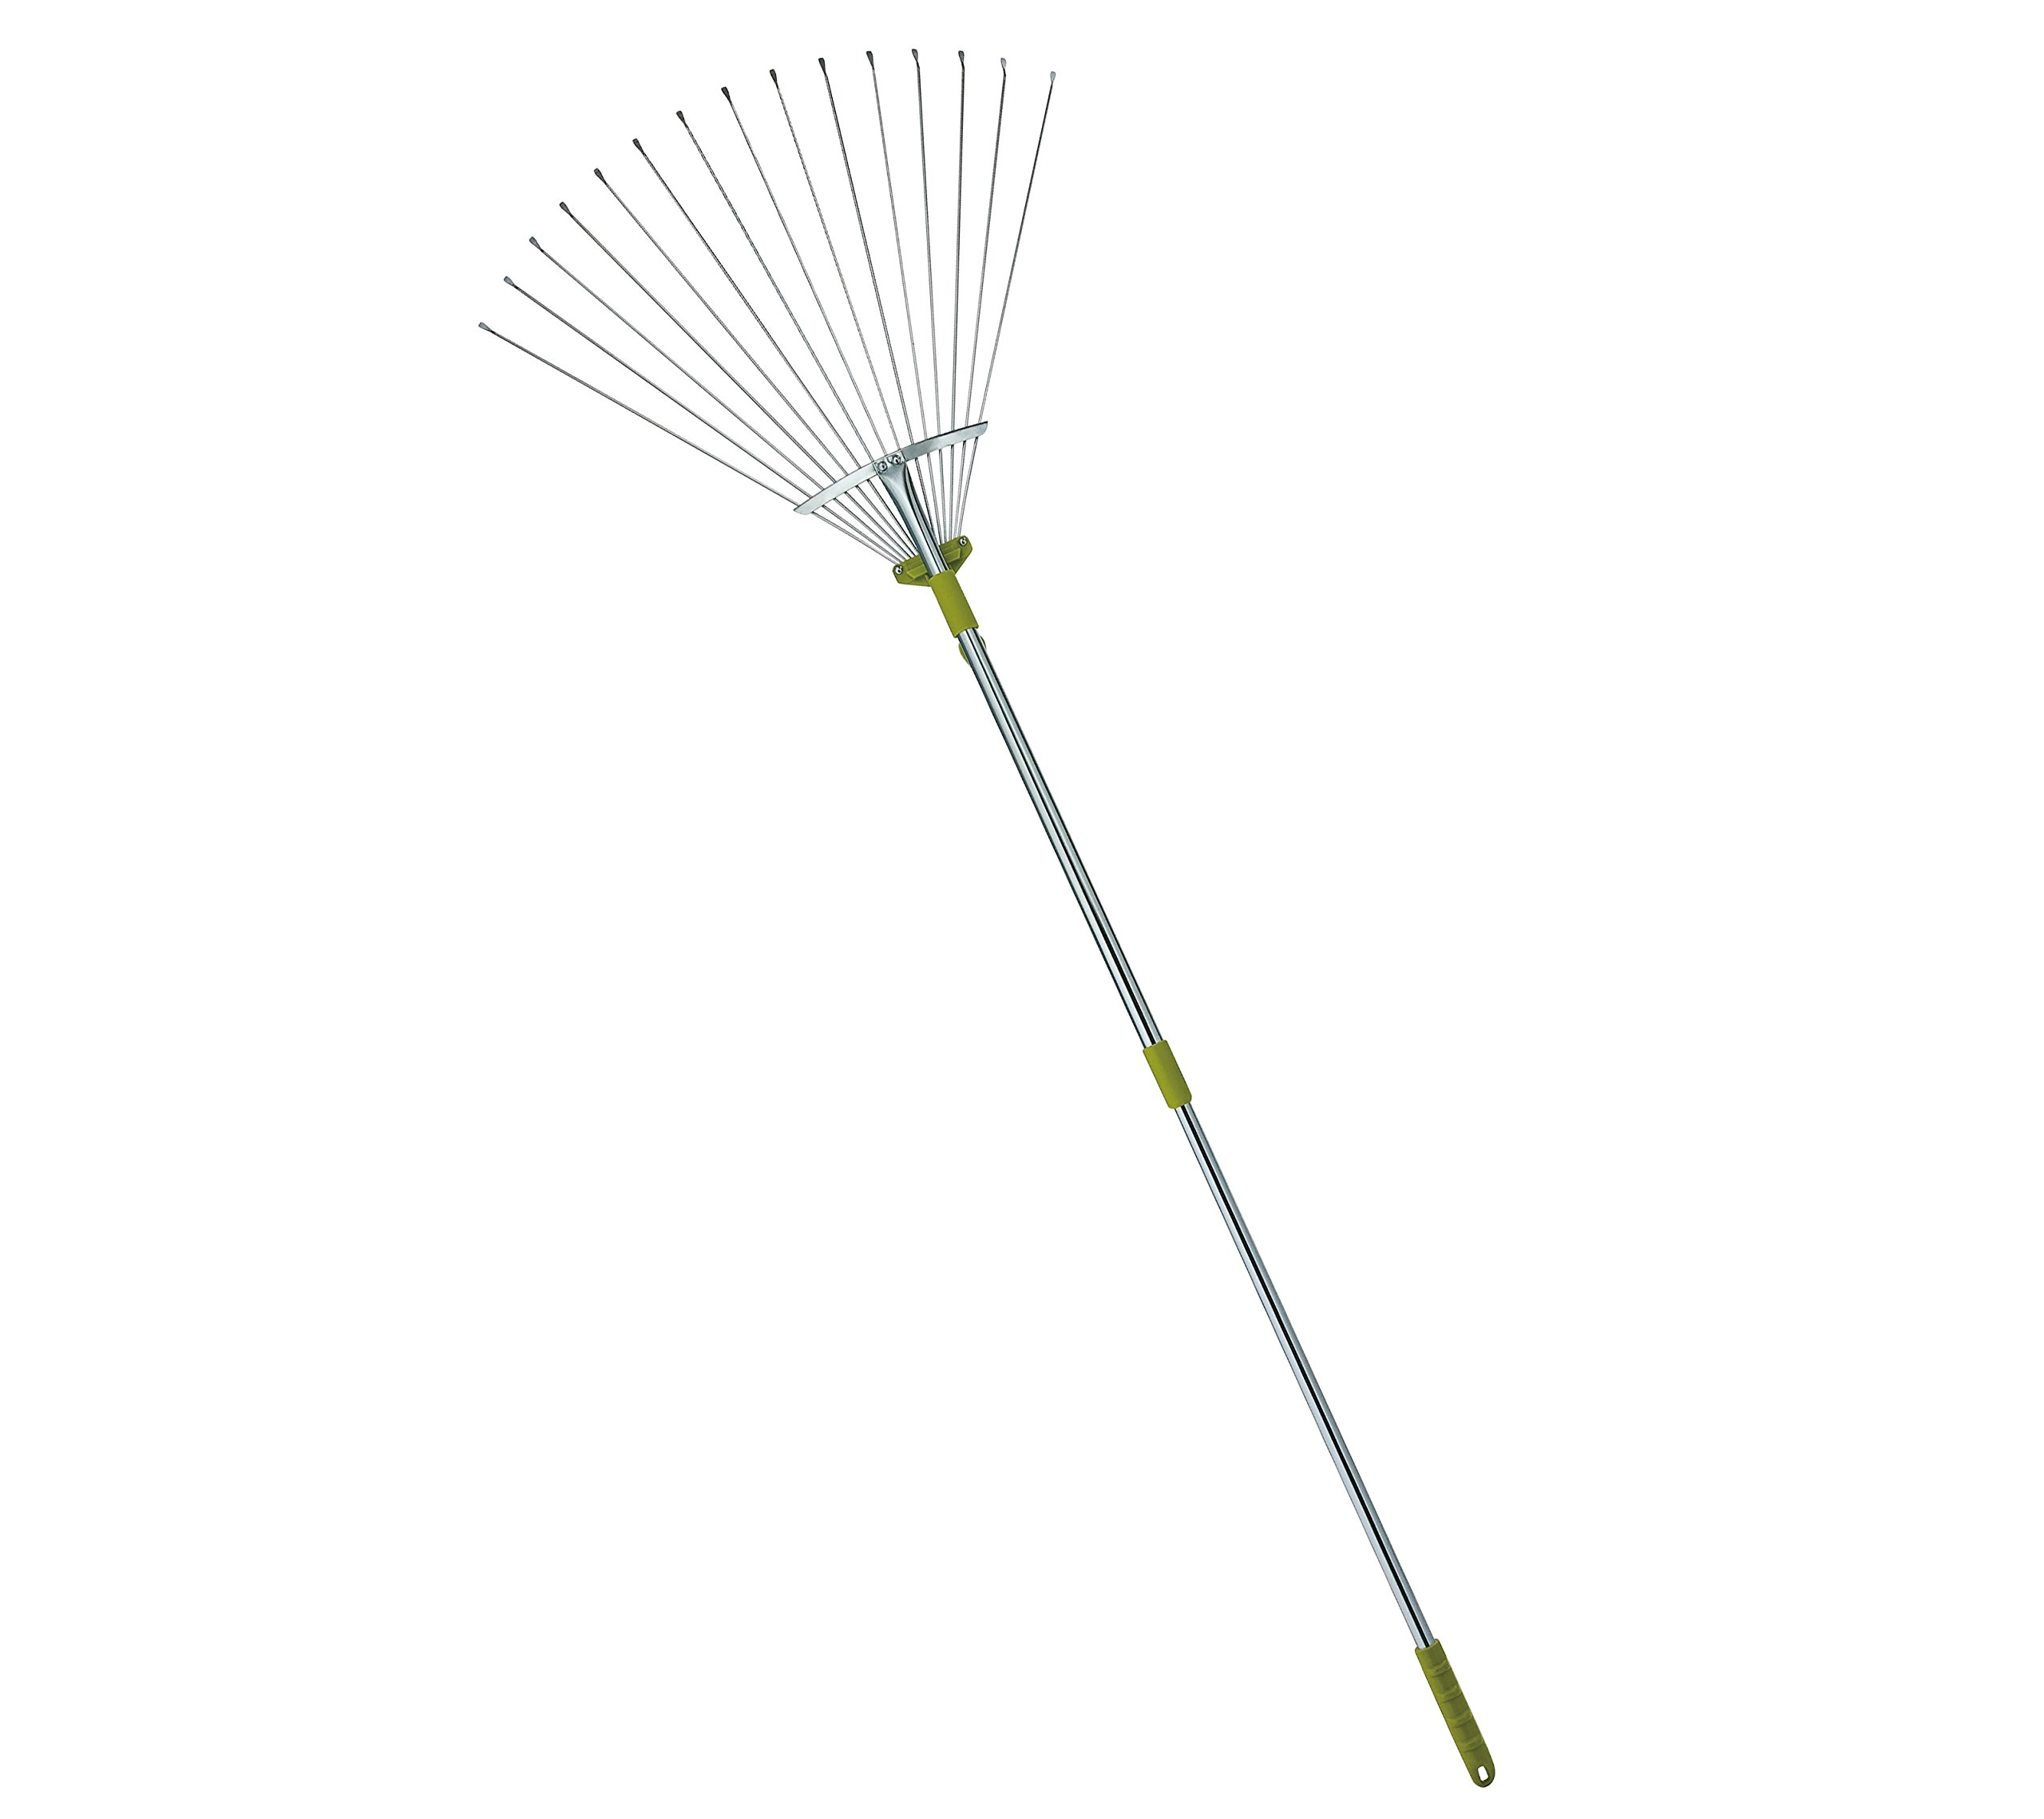 MLTOOLS Leaf Rake | 64-inch Adjustable Garden Leaf Rake | Garden Leaf Rake | Flat Tine Adjustable Steel Rake Extendable Handle R8236